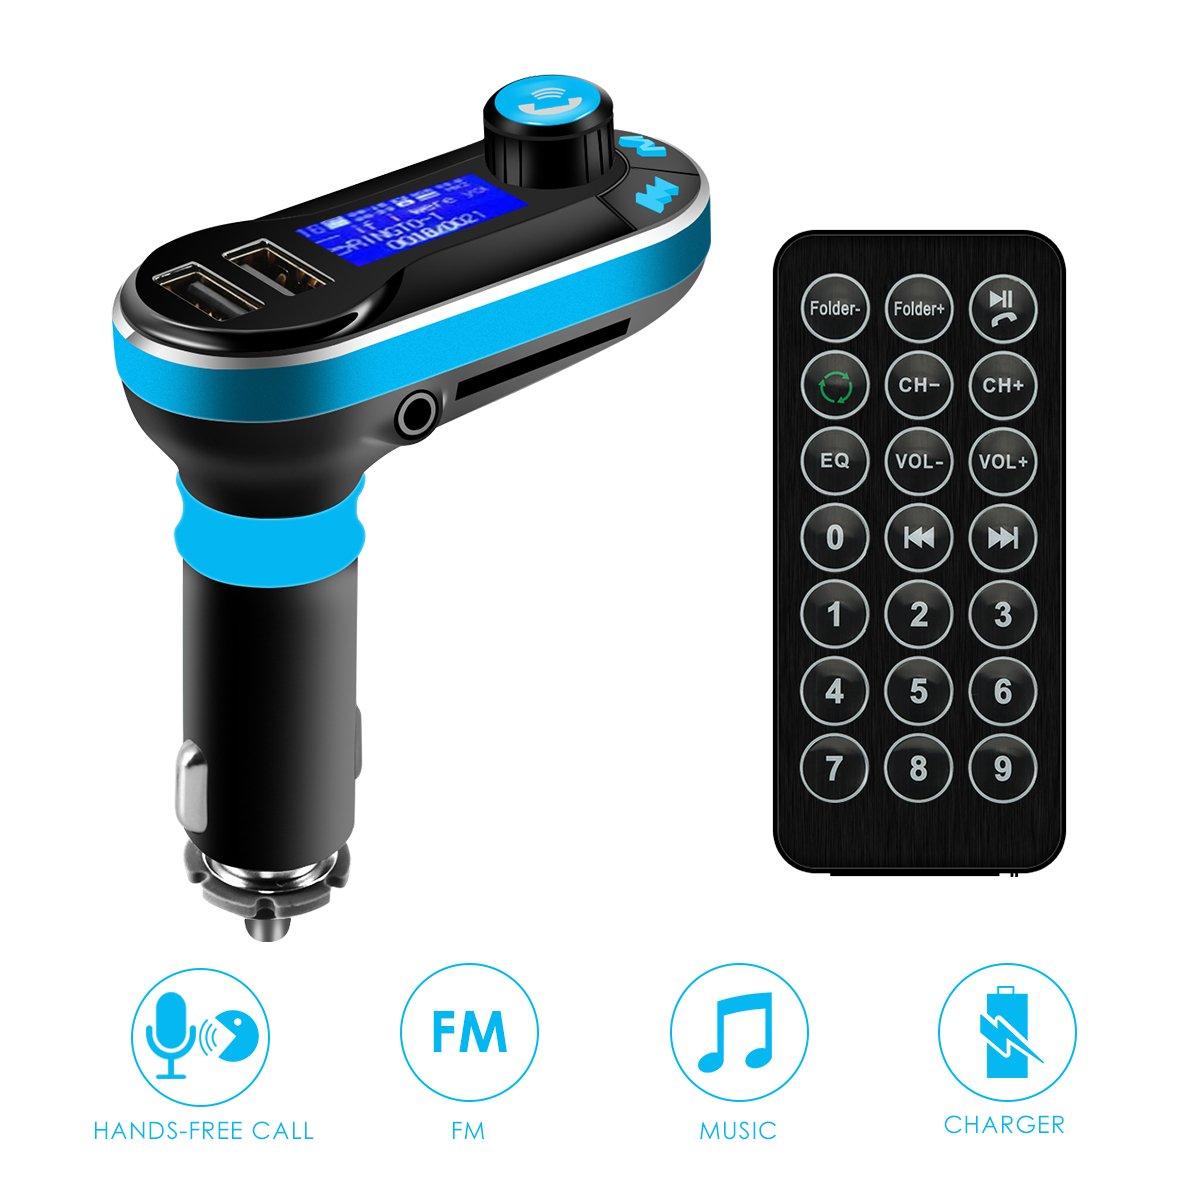 Amazoncom Agptekr Universal Wireless Bluetooth 30 Remote Control